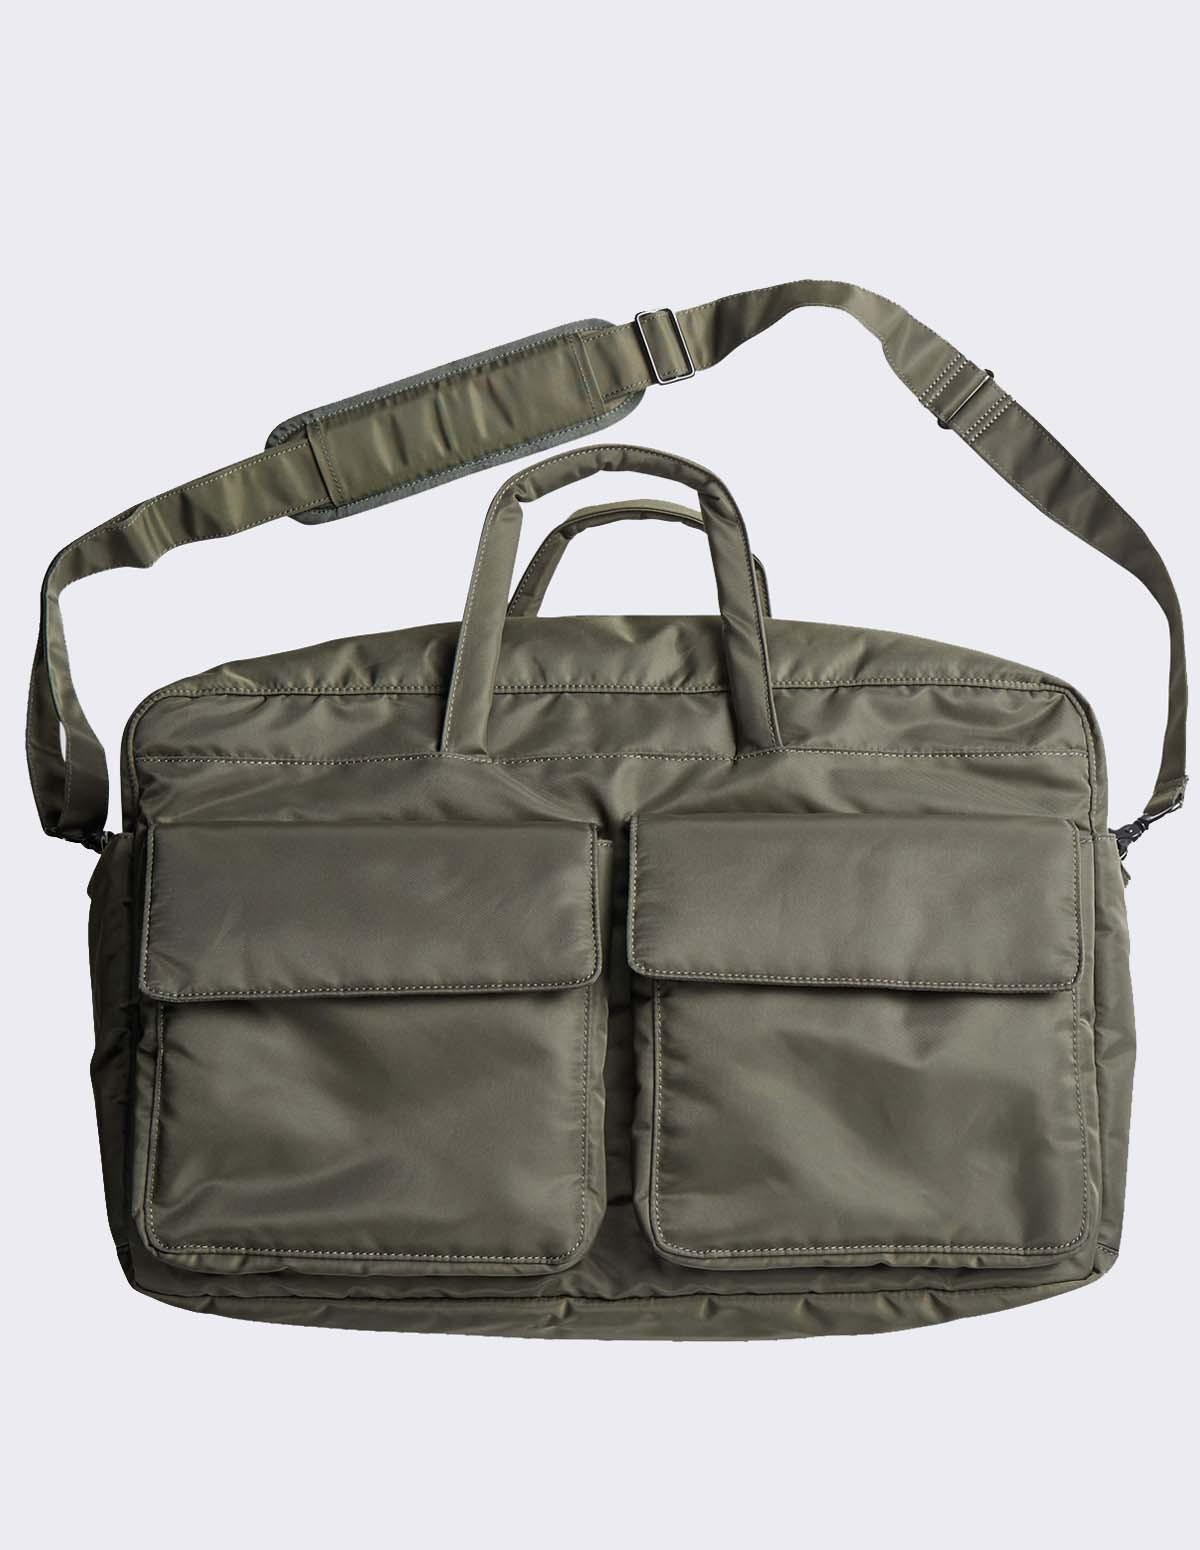 Nn07 Weekend Bag 9166 - 301 ARMY